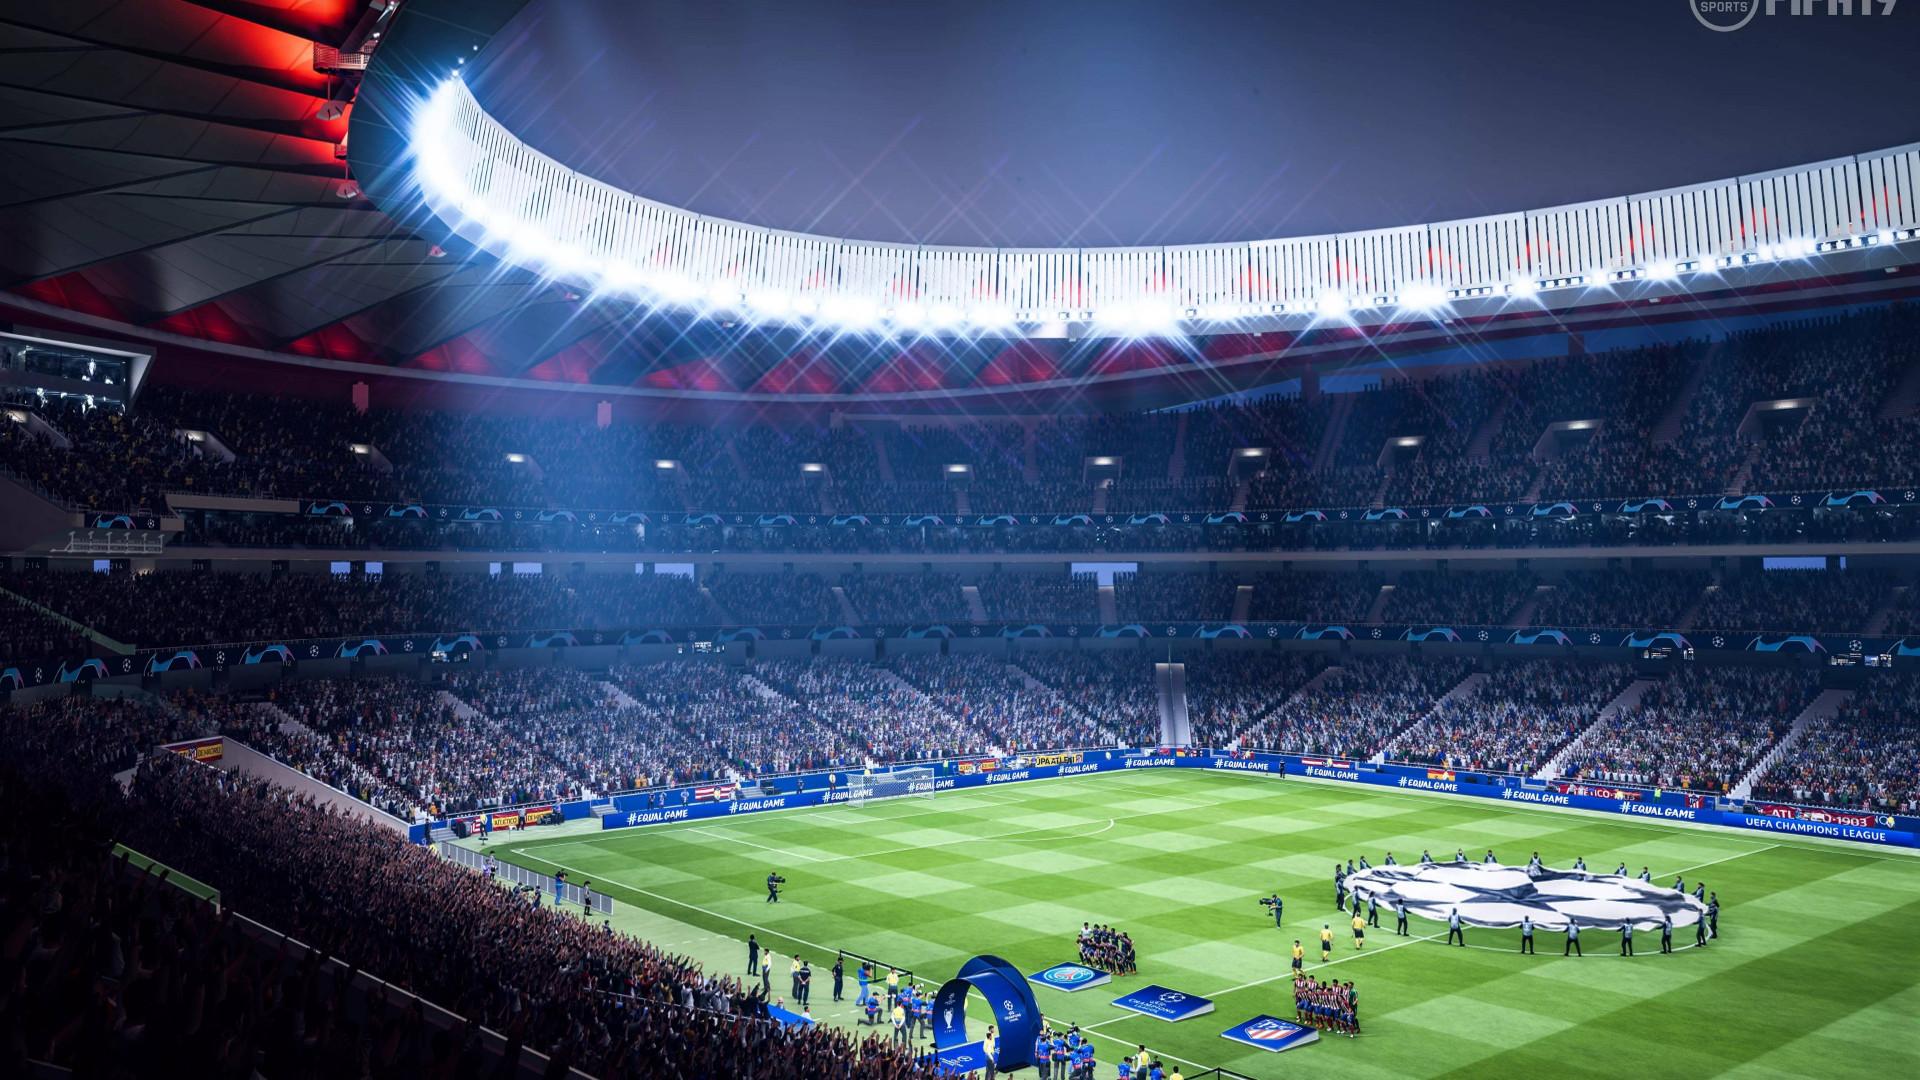 Download Wallpaper Fifa 19 Stadium 1920x1080